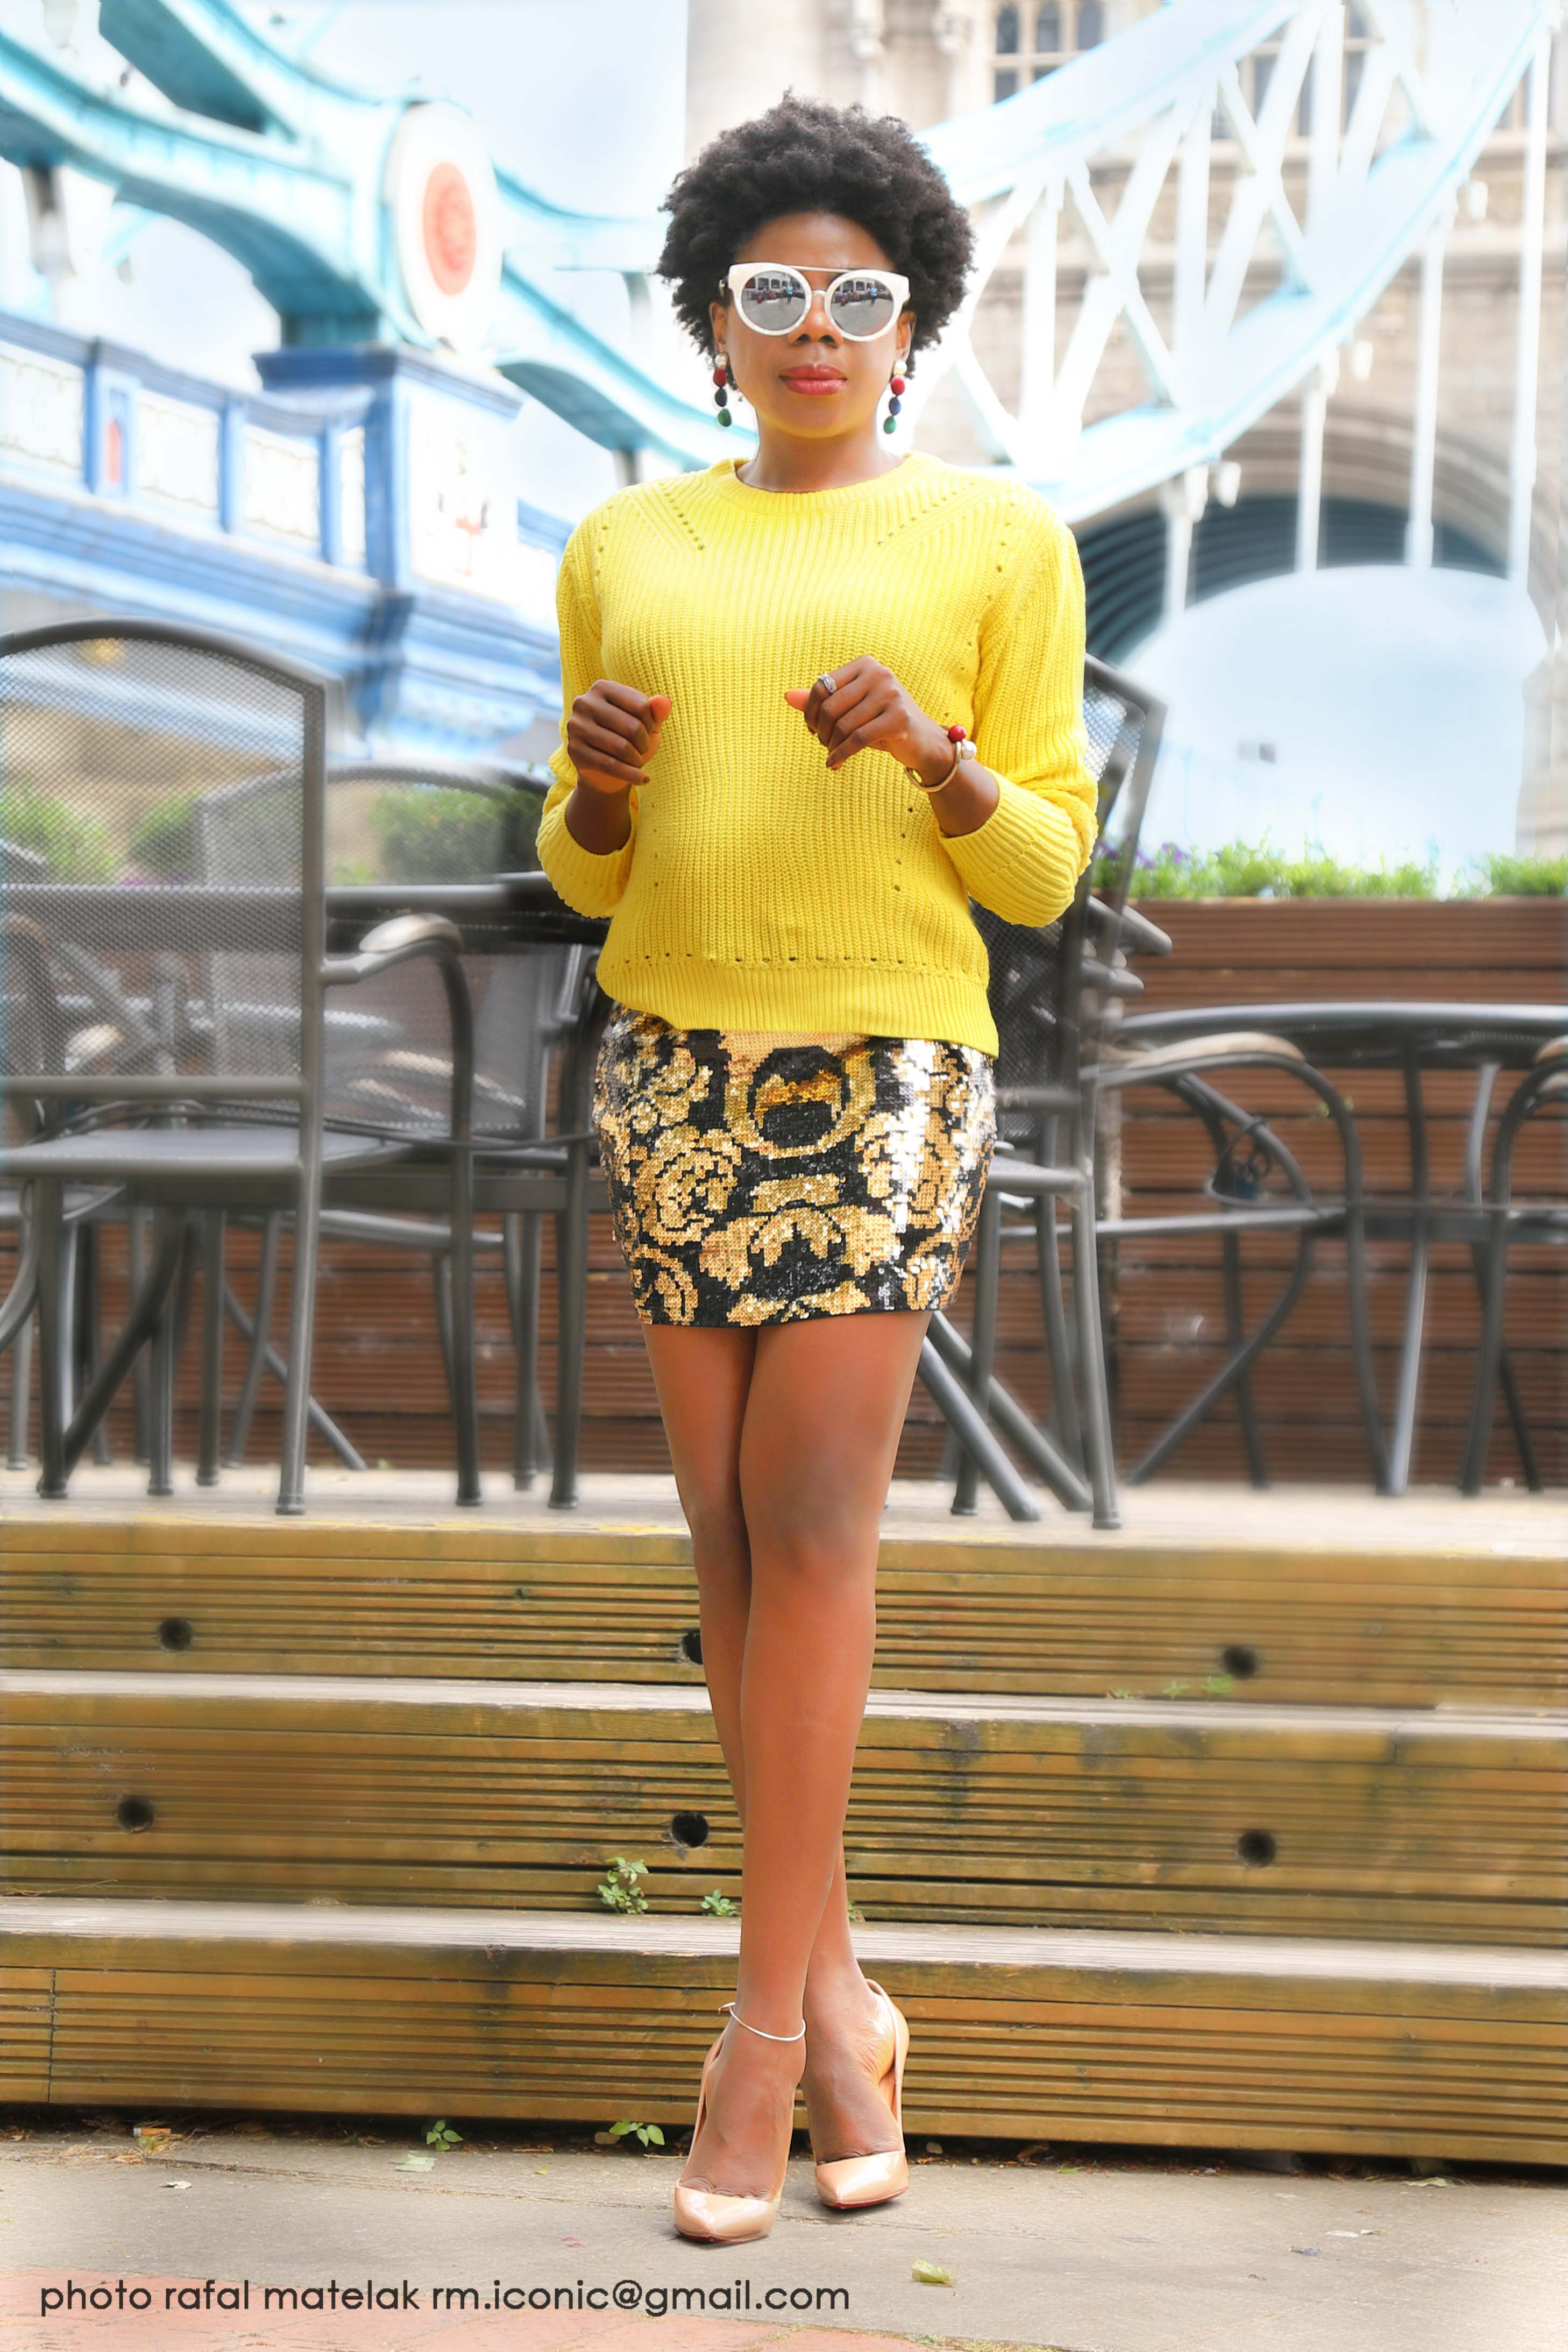 Sequin Skirt X Chunky Knit Jumper